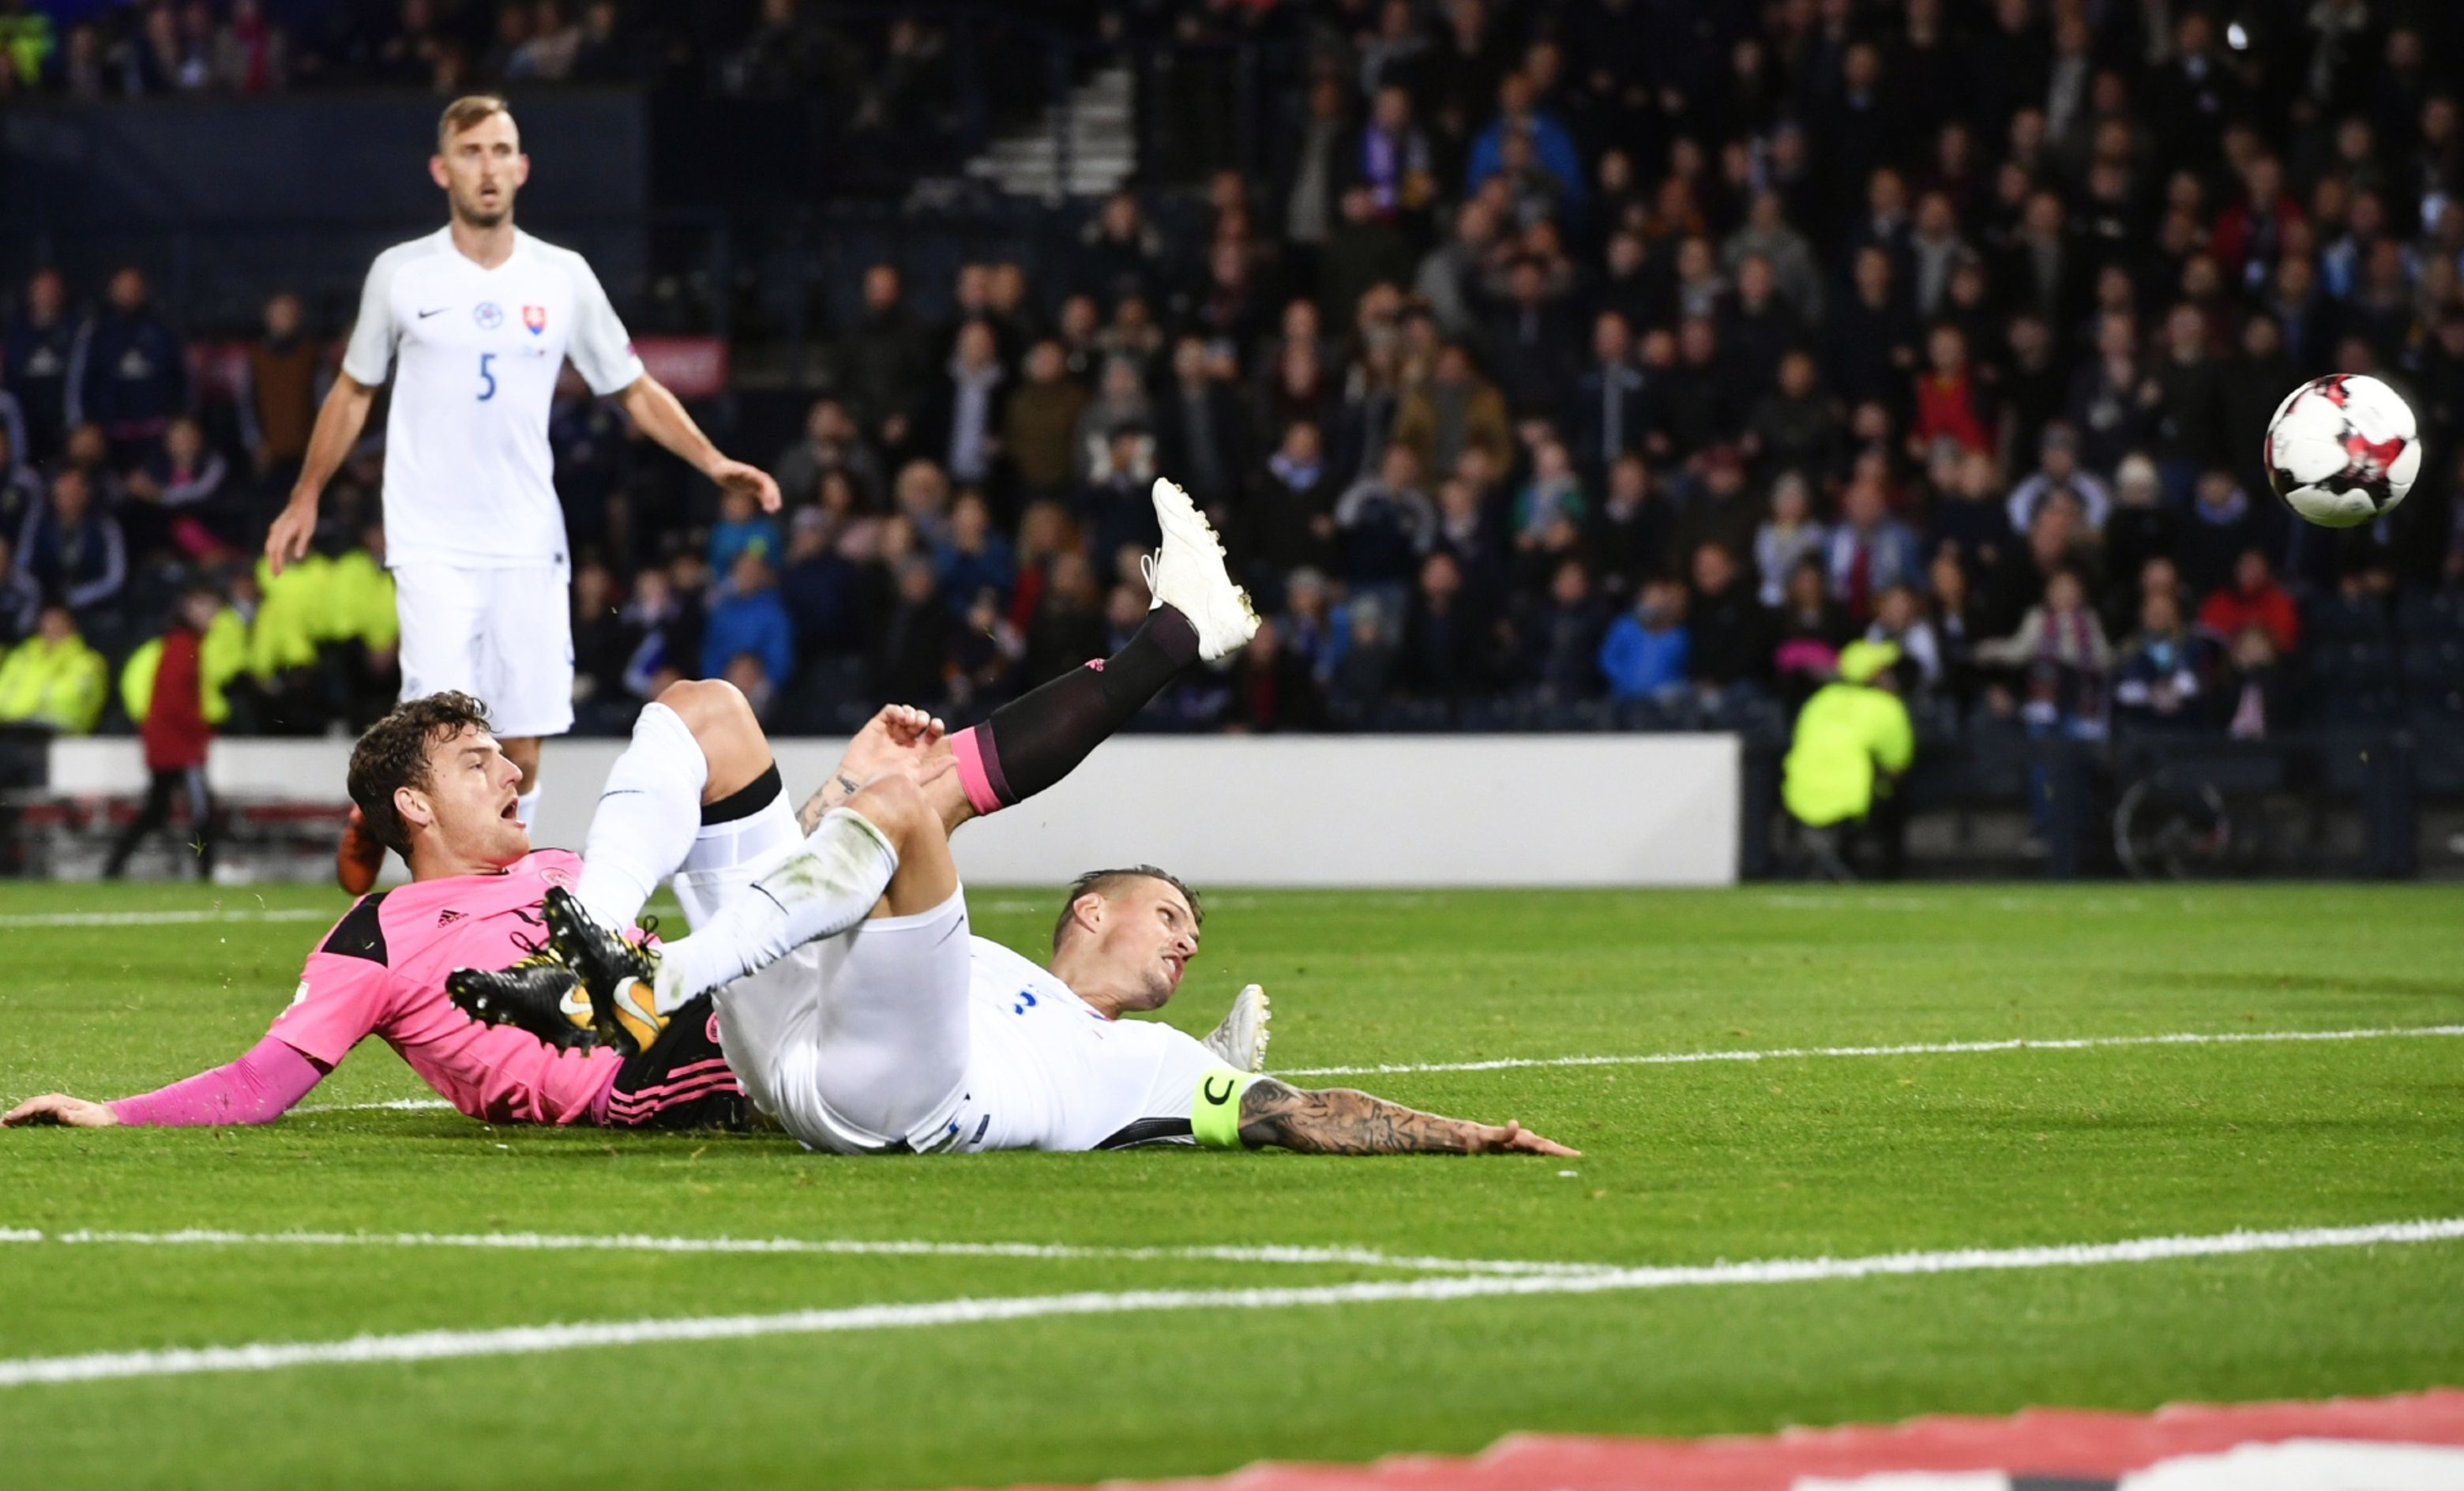 Chris Martin is beaten to the ball by Slovakian defender Martin Skrtel.